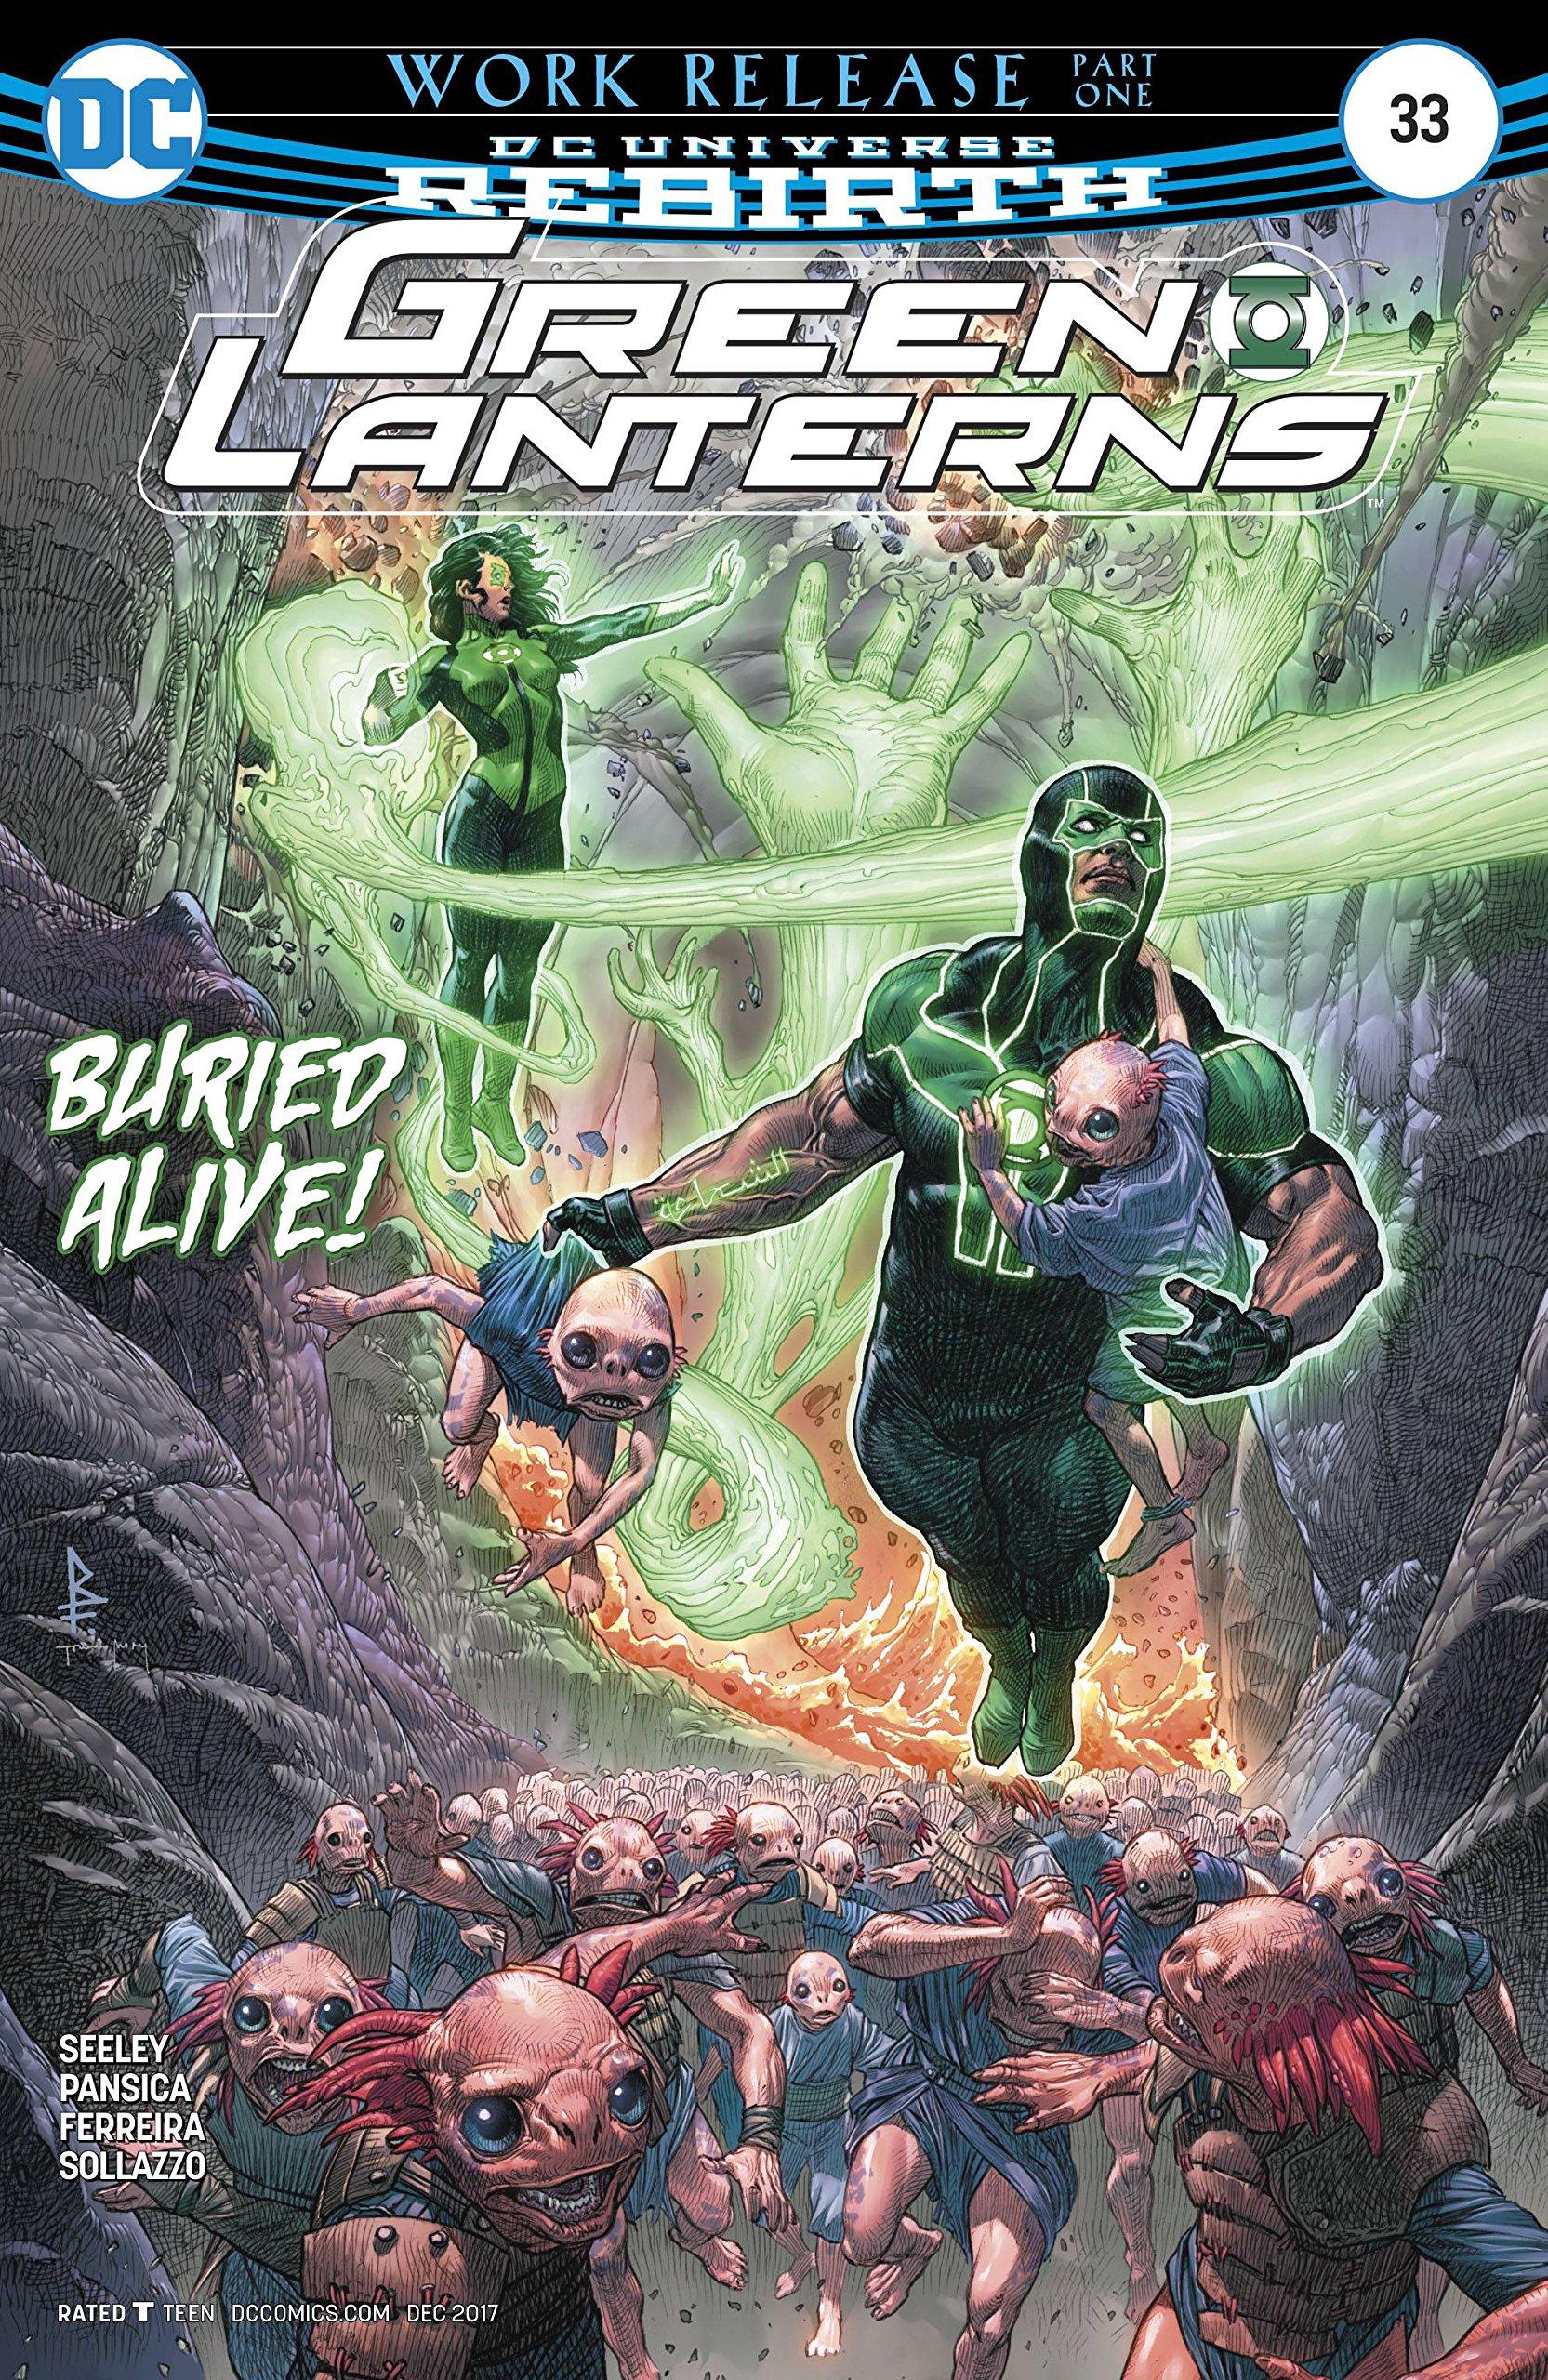 Read Online Green Lanterns #33 pdf